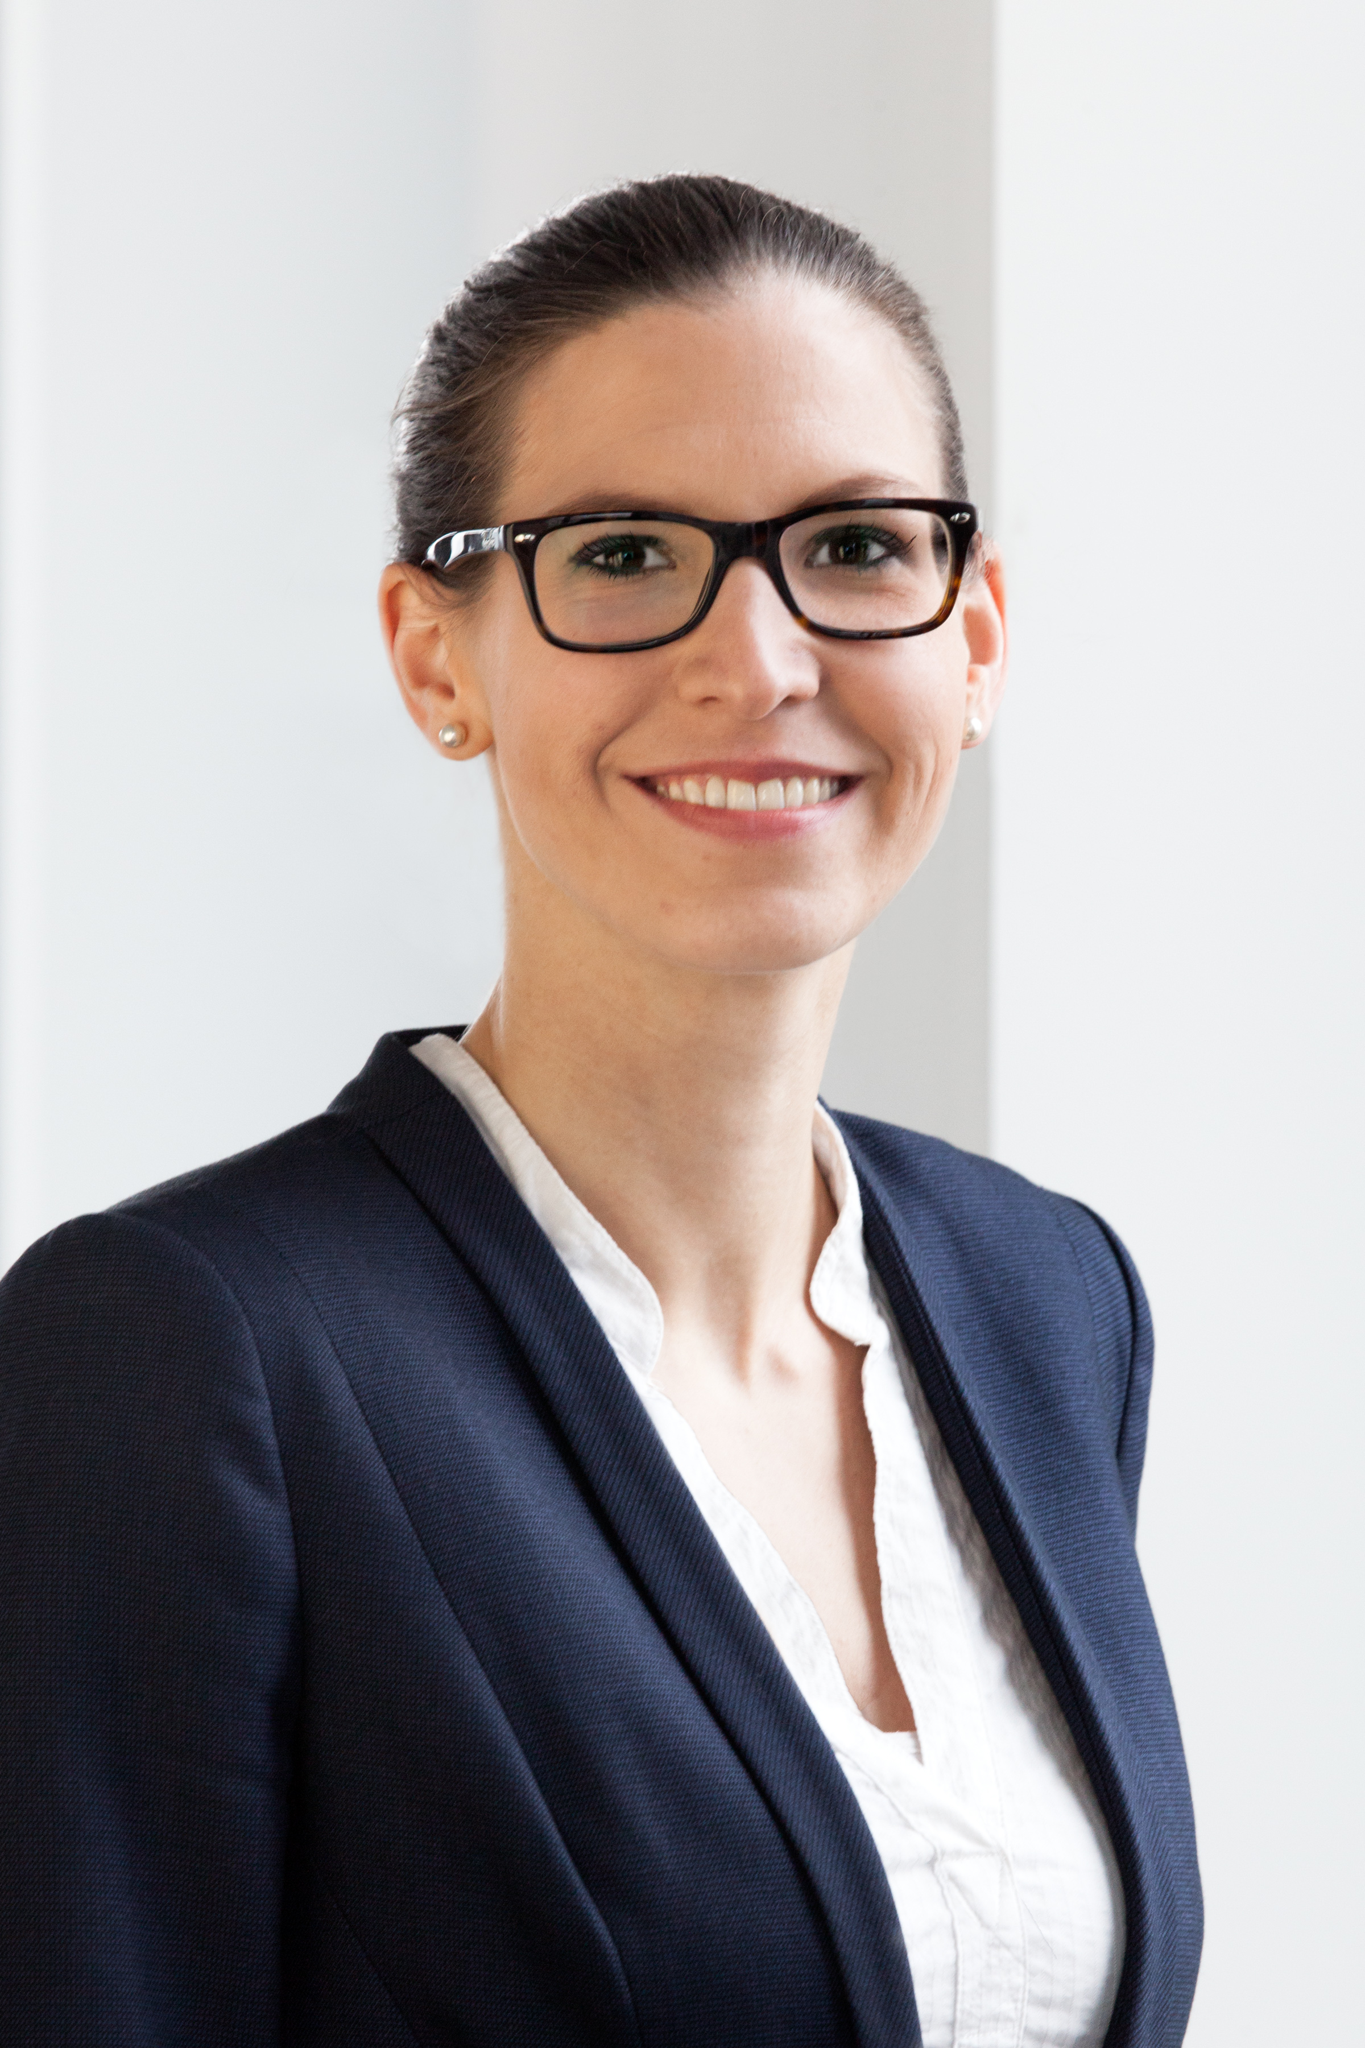 Vanessa Bollenbach